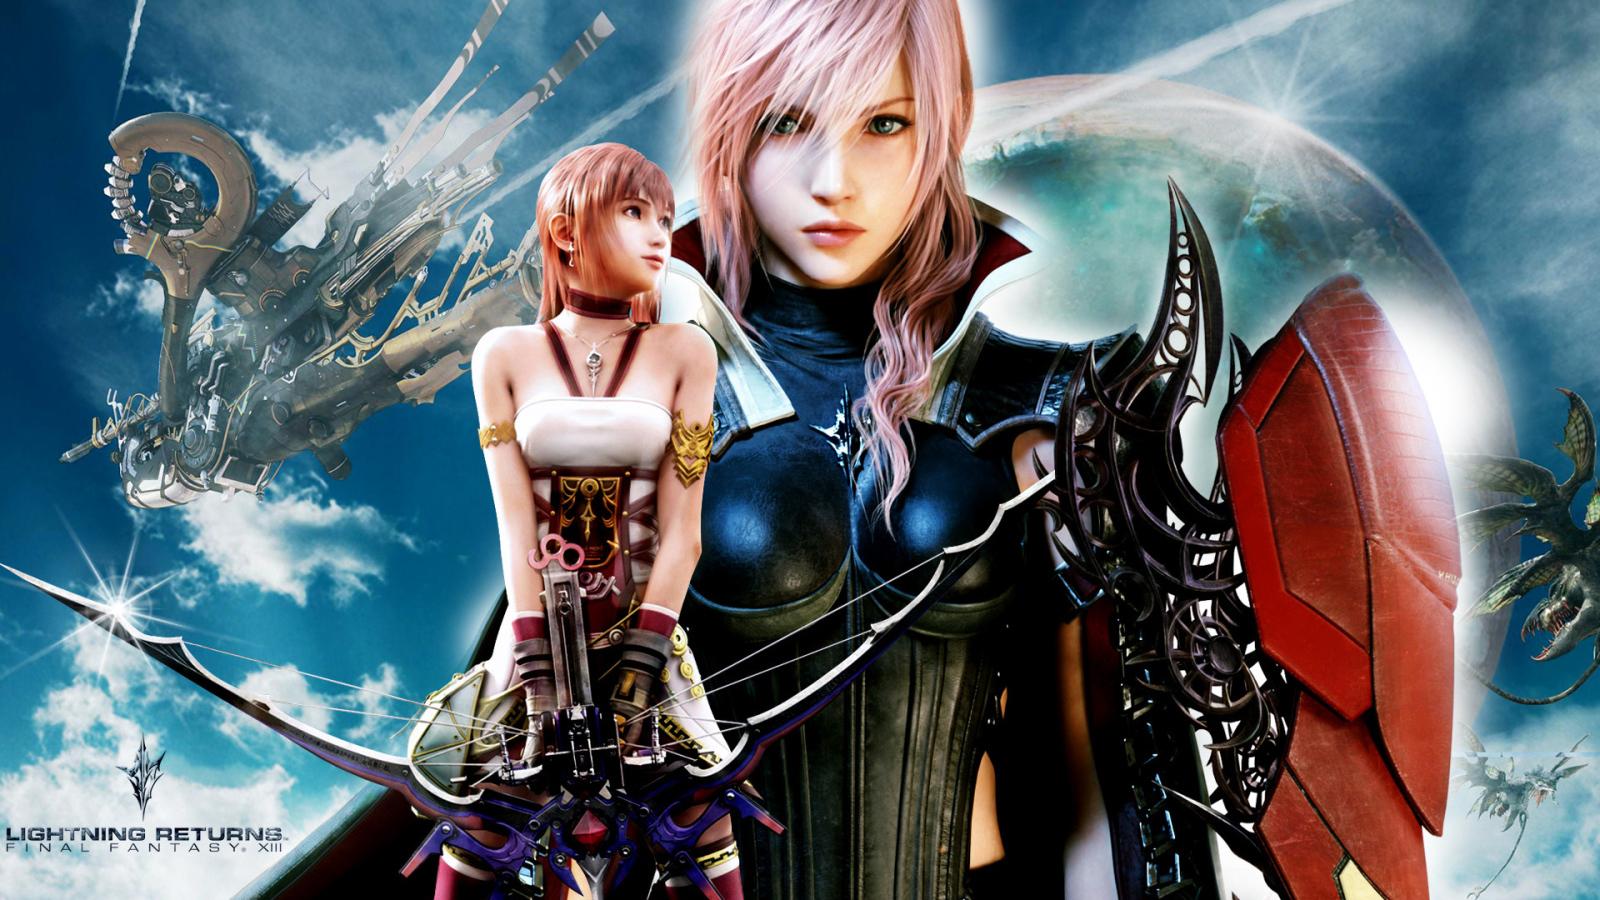 The Heroine Of The Game Final Fantasy Xv Desktop Wallpapers 1600x900